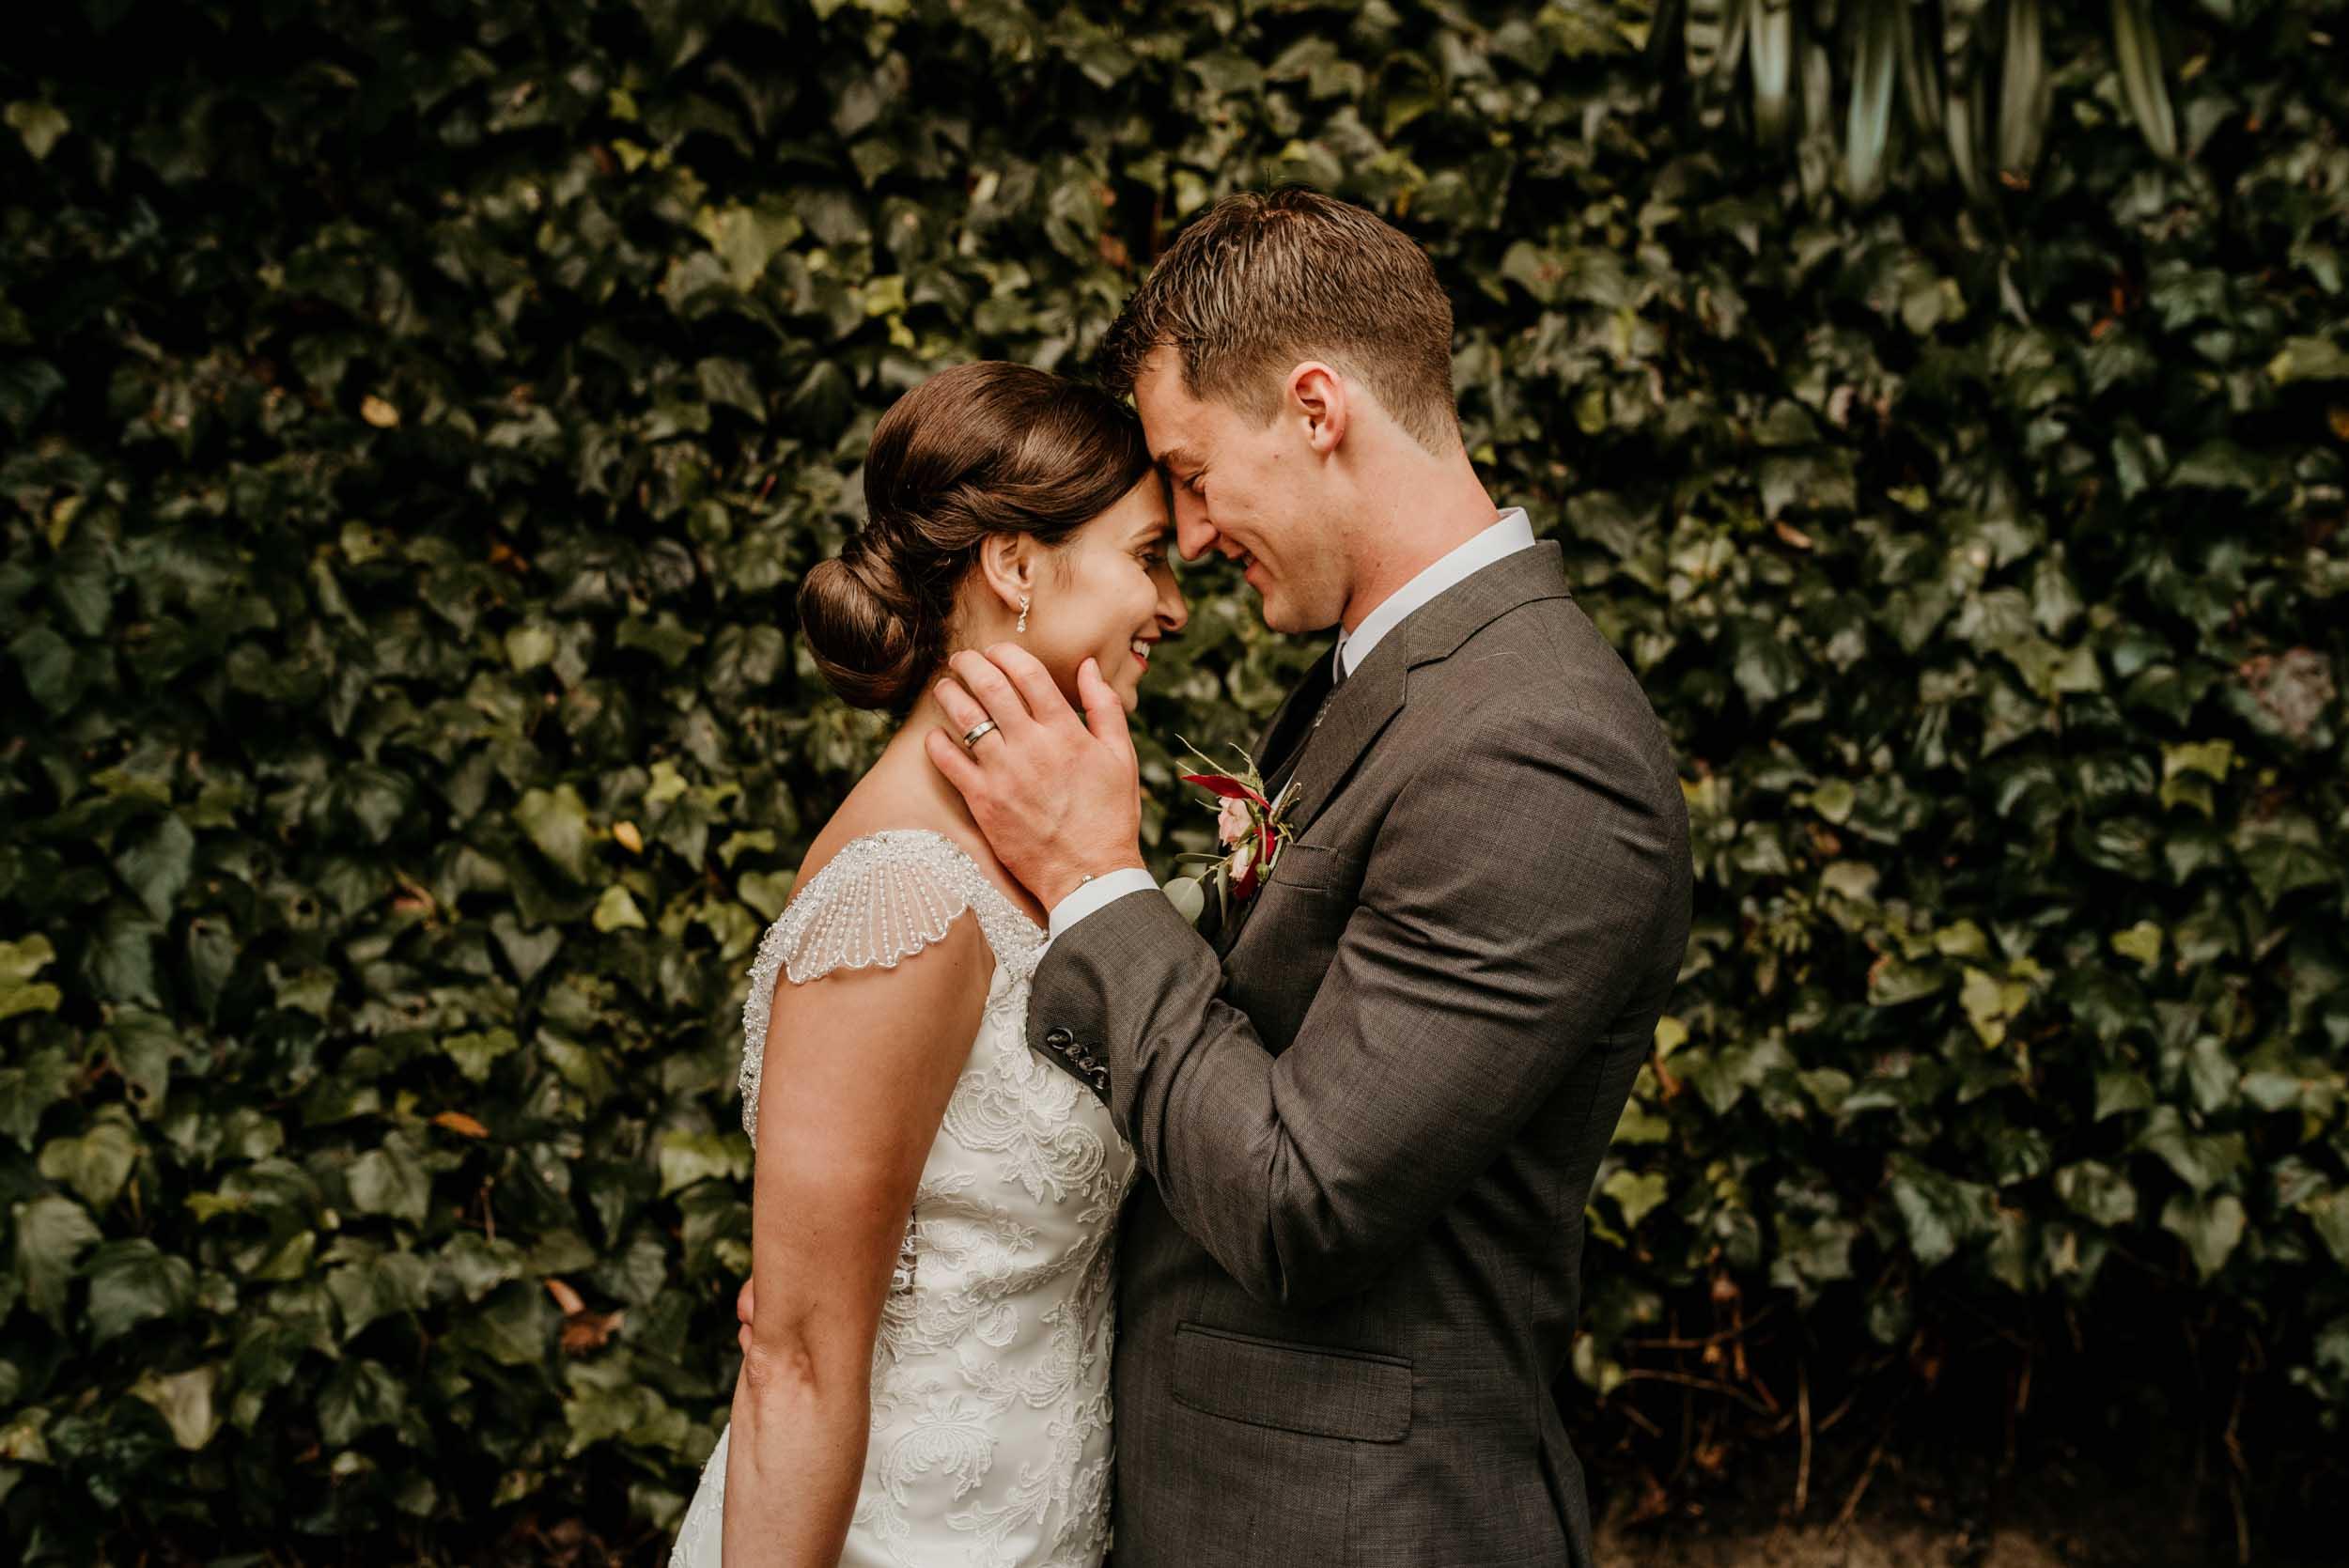 The Raw Photographer - Cairns Wedding Photographer - New Zealand Destination Photography - Travel - Australian-3.jpg